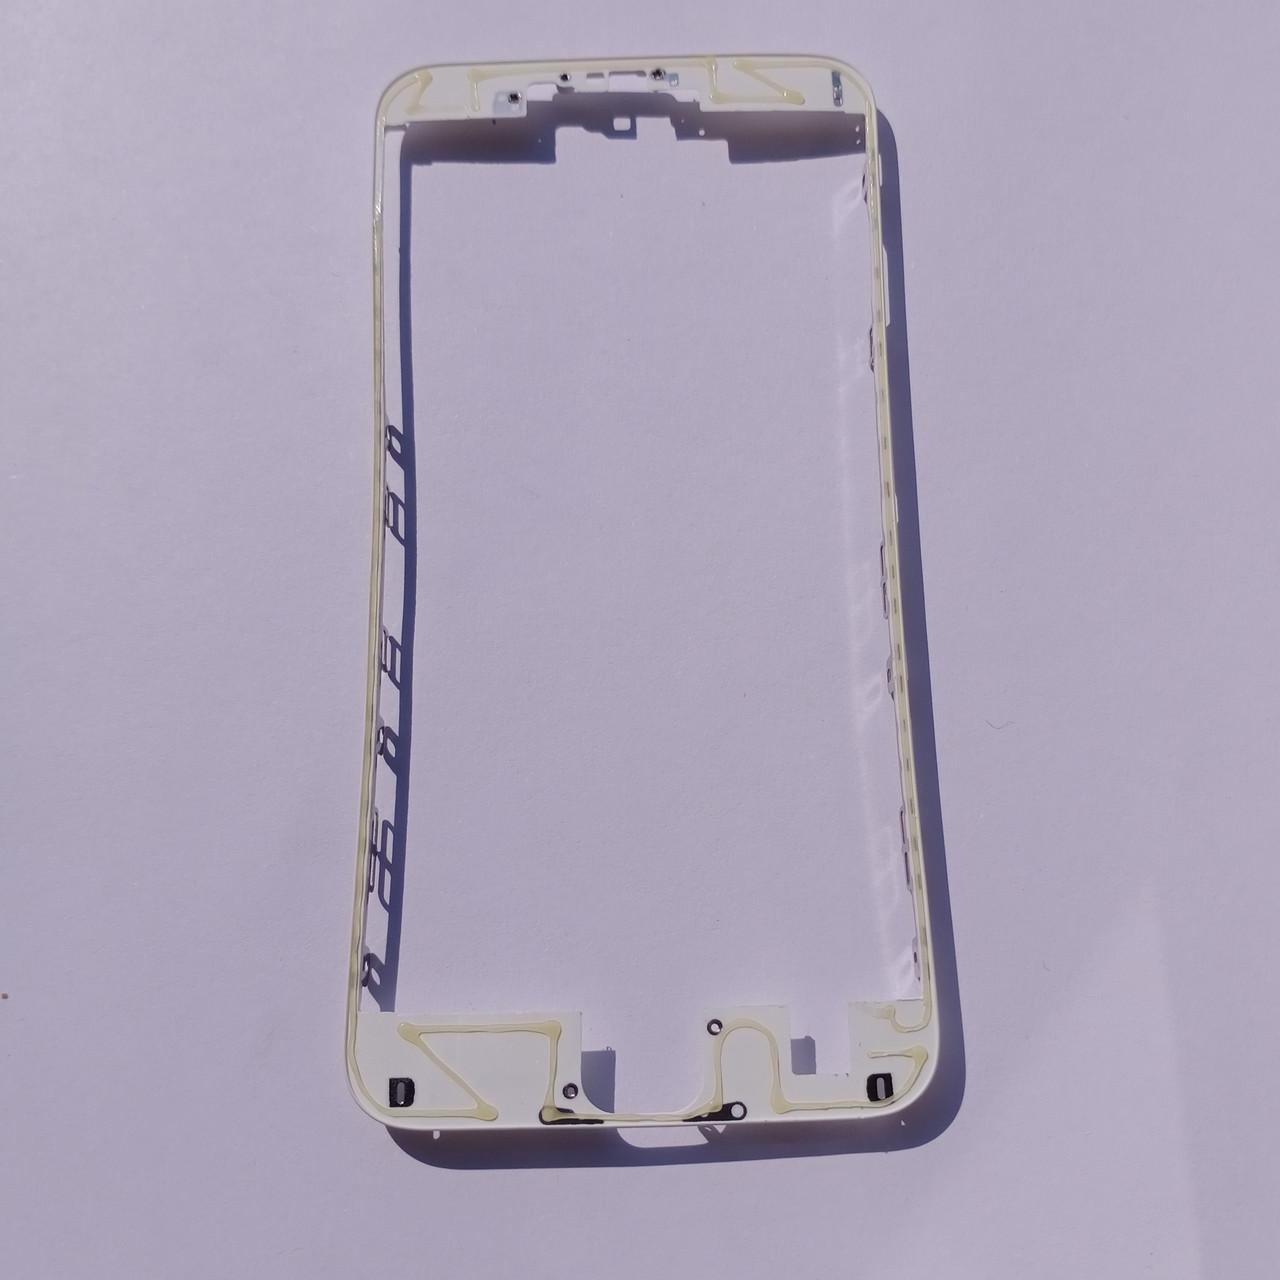 Рамка крепления дисплейного модуля Novacel для Apple iPhone 6S Plus White